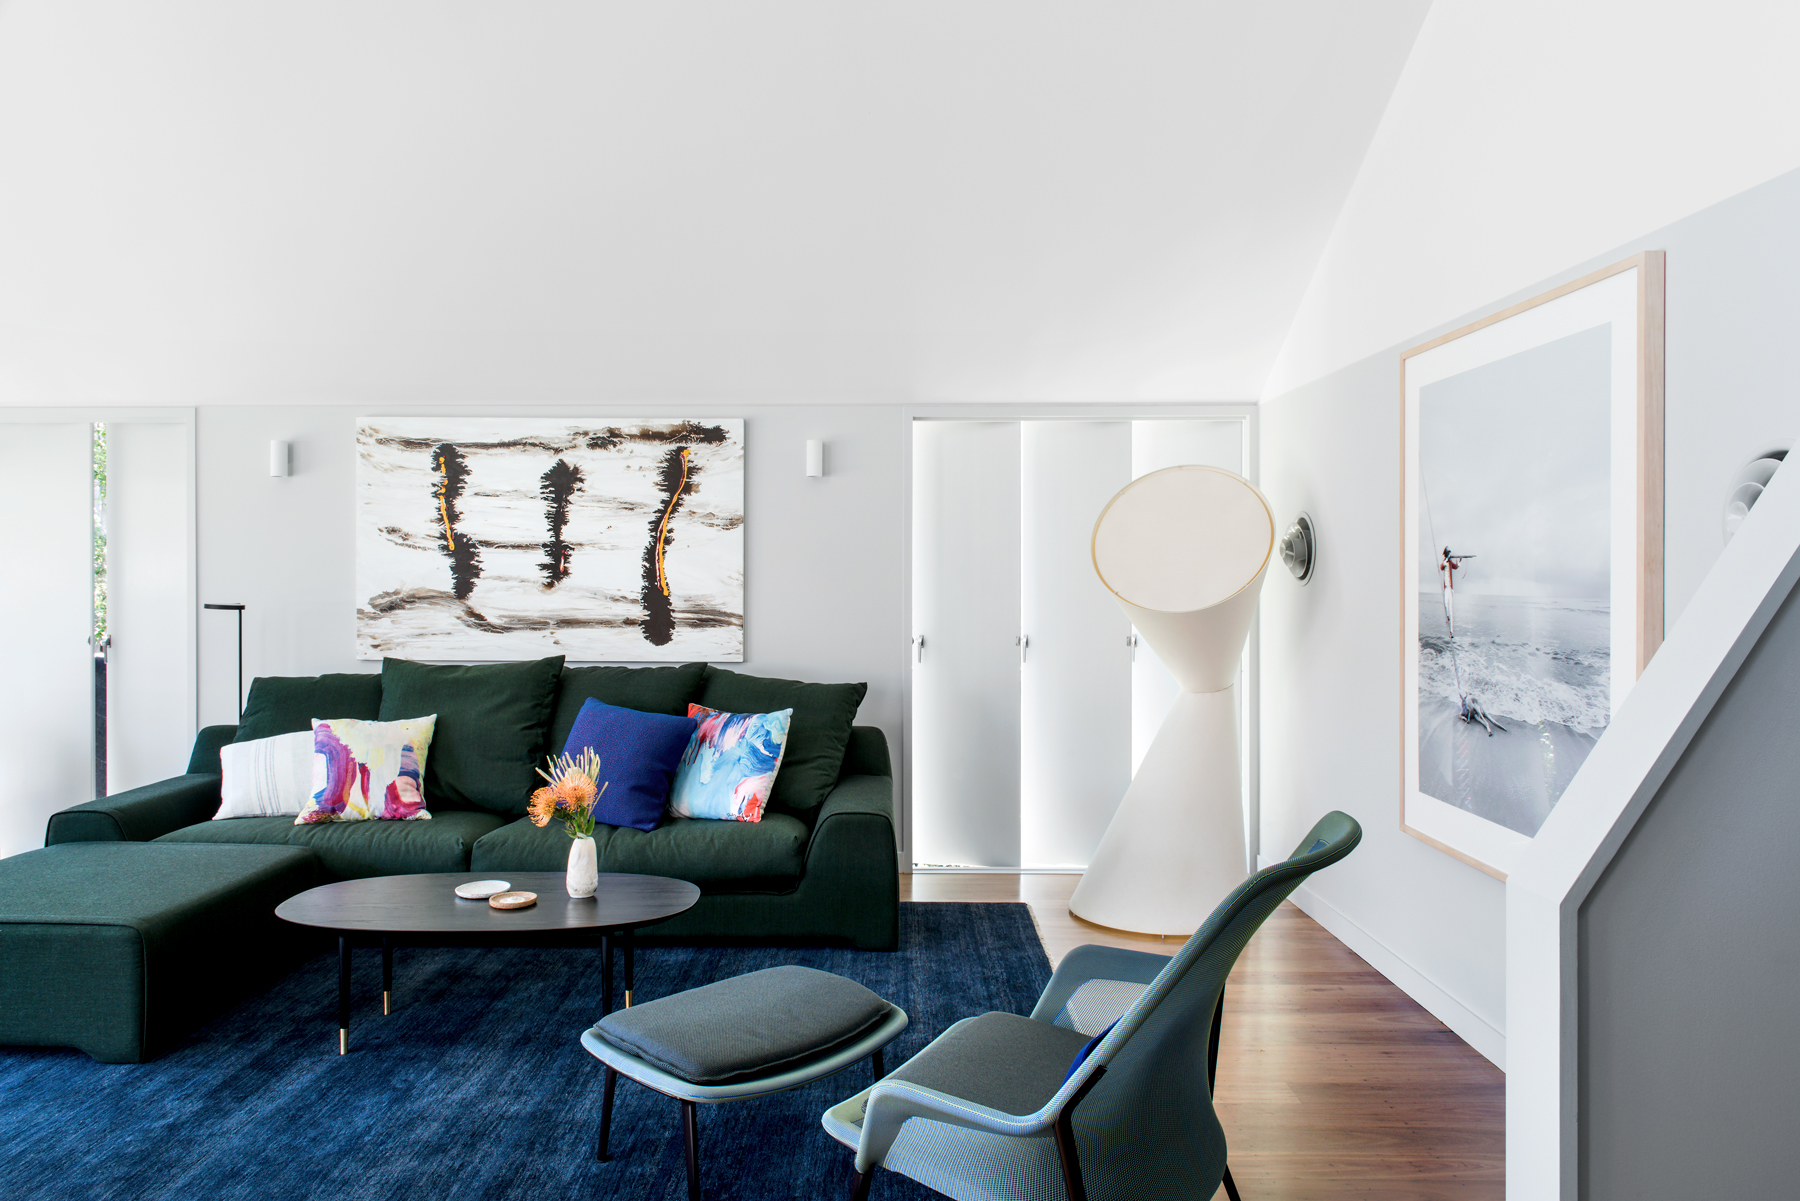 georgia-cannon-interior-designer-brisbane-rawson-house_02_S.jpg